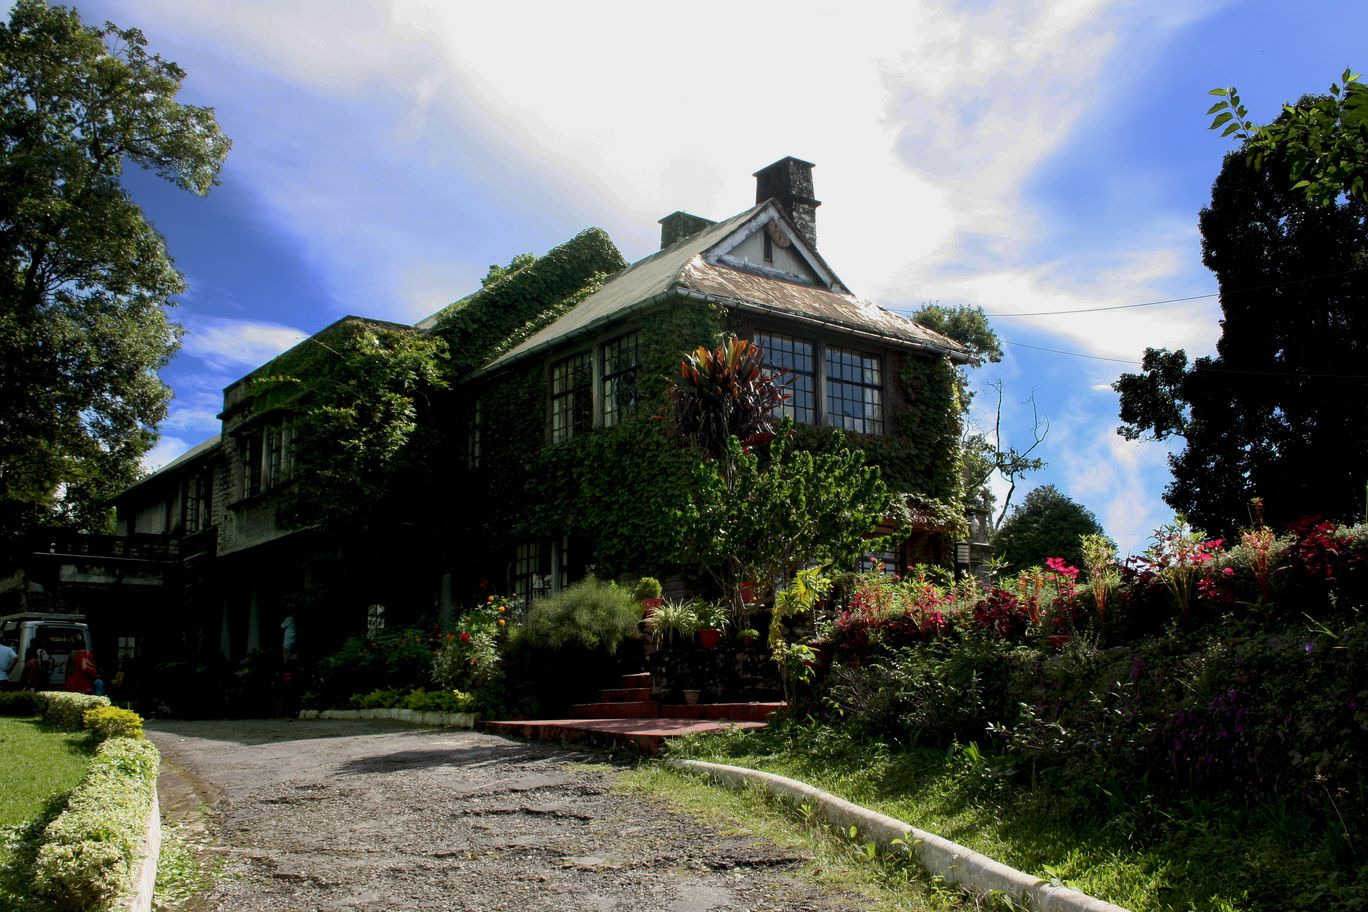 Photo of Morgan House - Bengal Tourism - Kalimpong By Arpit Raj